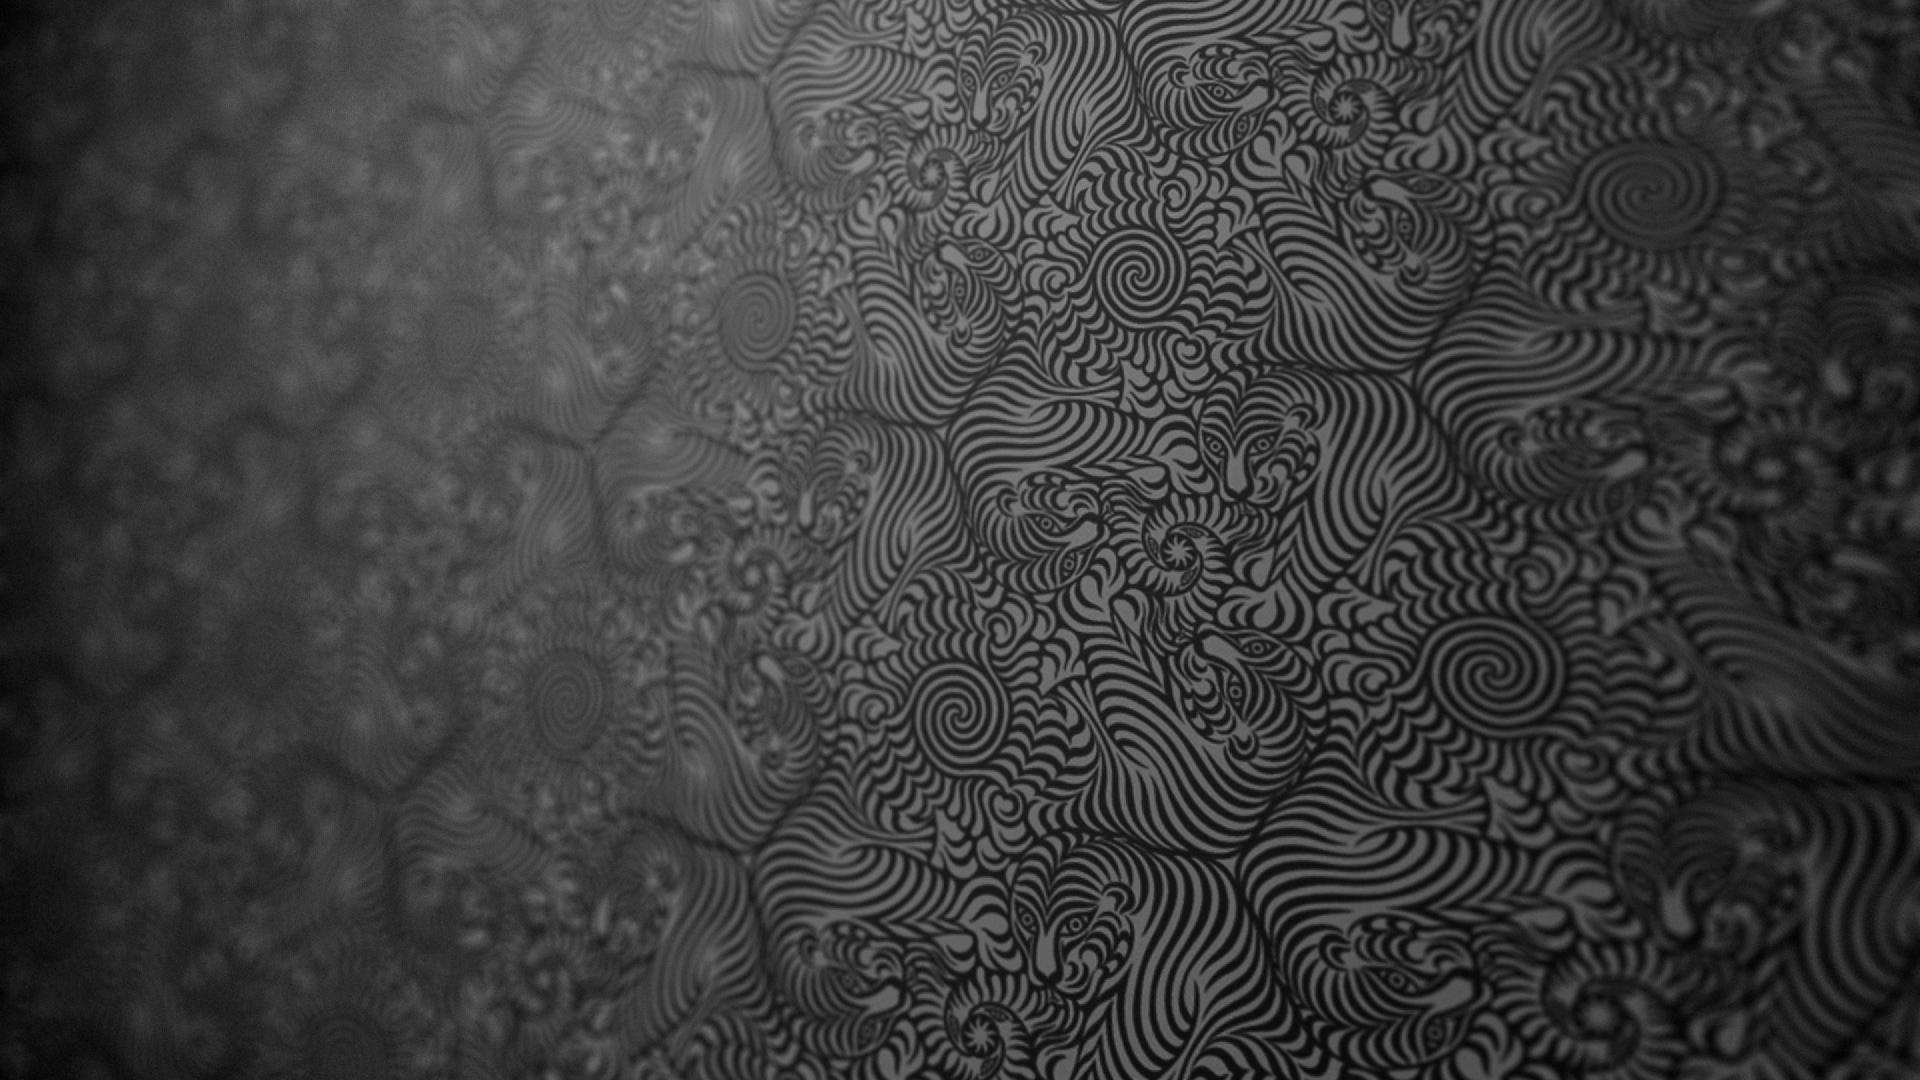 Texture-wallpaper-HD-download-desktop